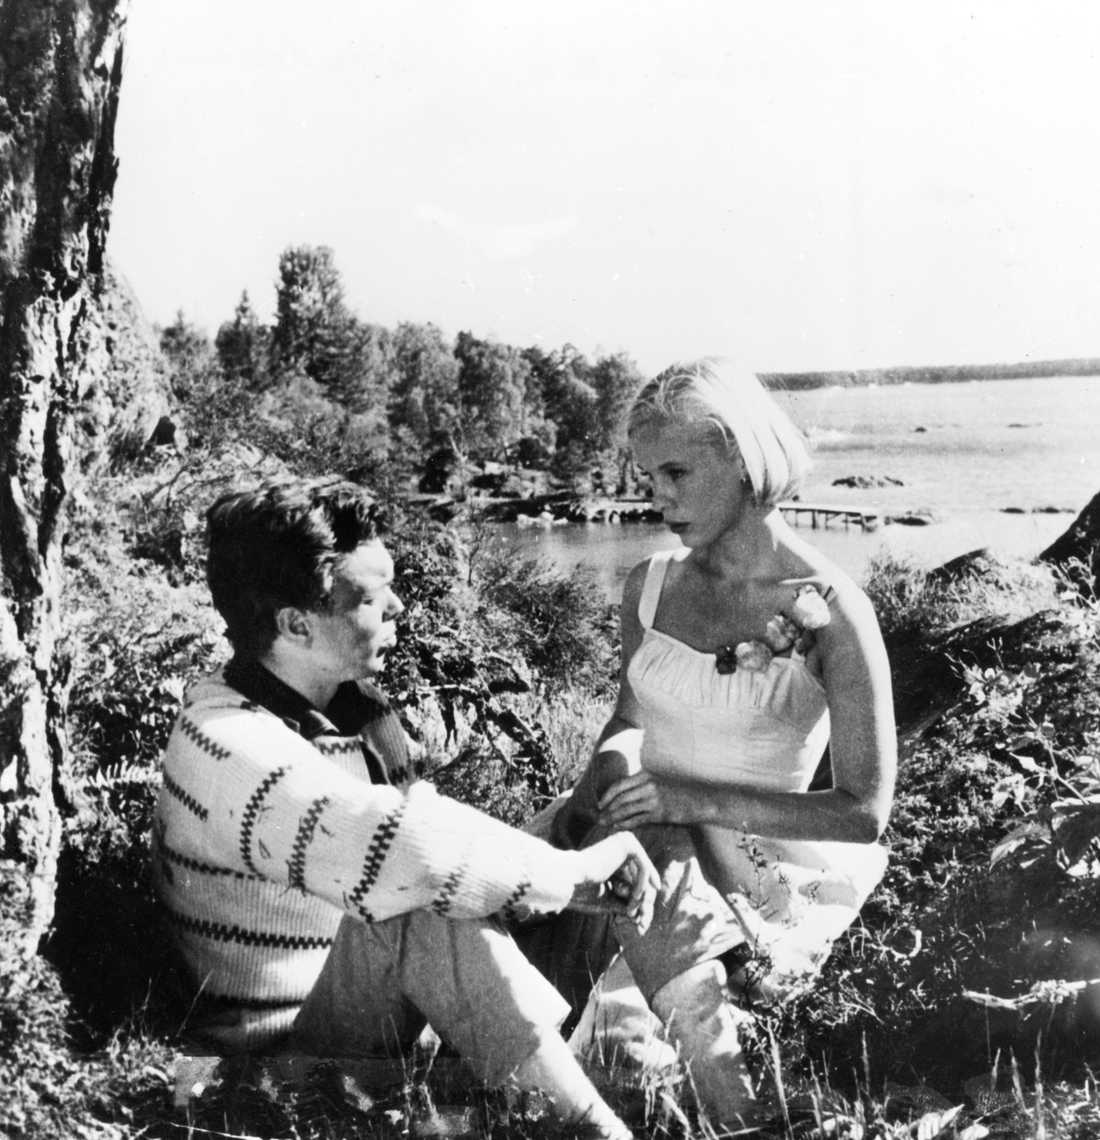 Bibi Andersson och Claes-Håkan Westergren. Okänt fotodatum.